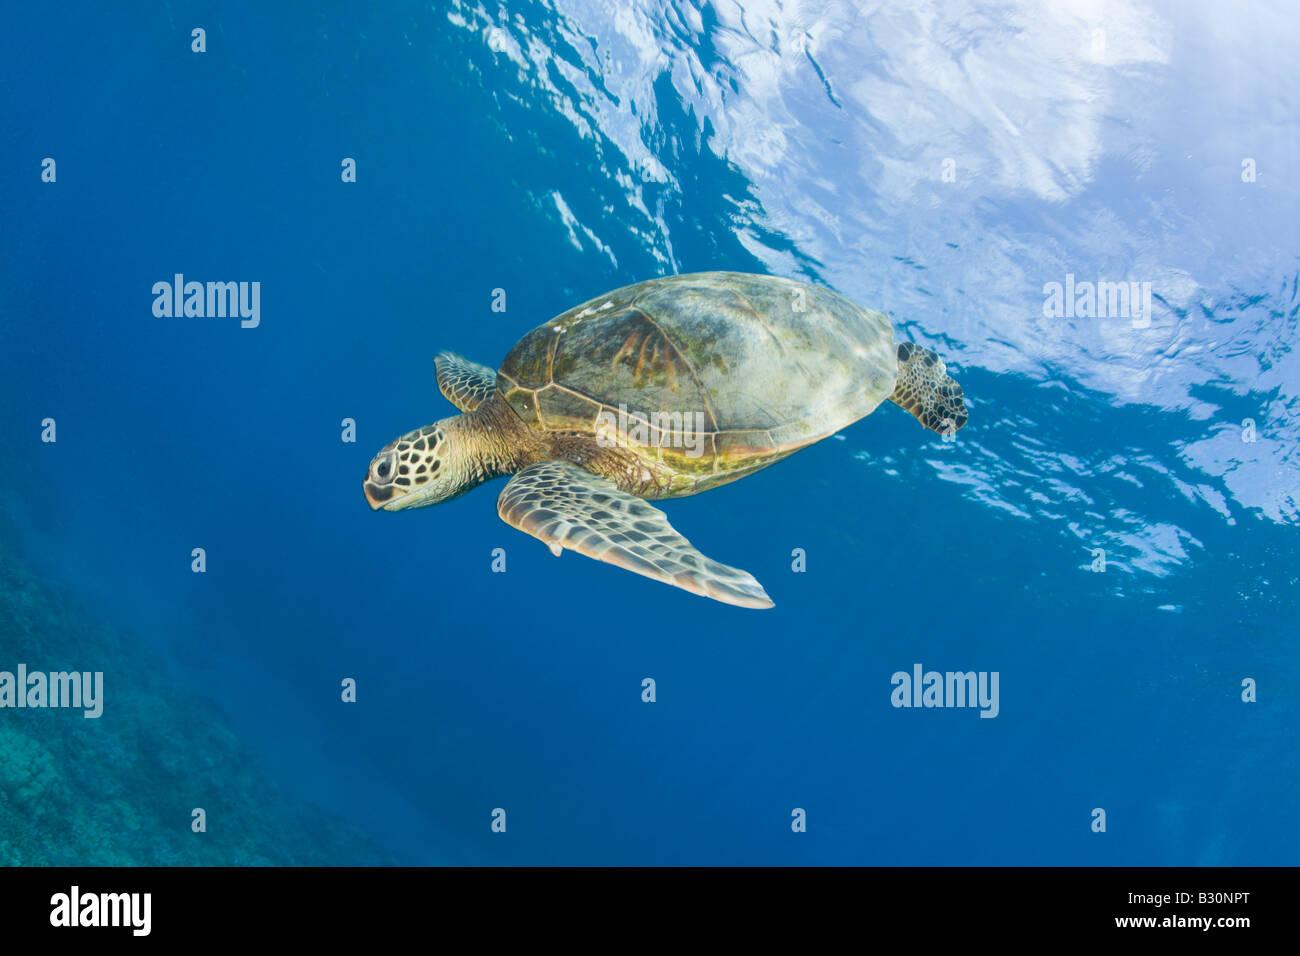 Green Turtle Chelonia mydas Marshall Islands Bikini Atoll Micronesia Pacific Ocean - Stock Image